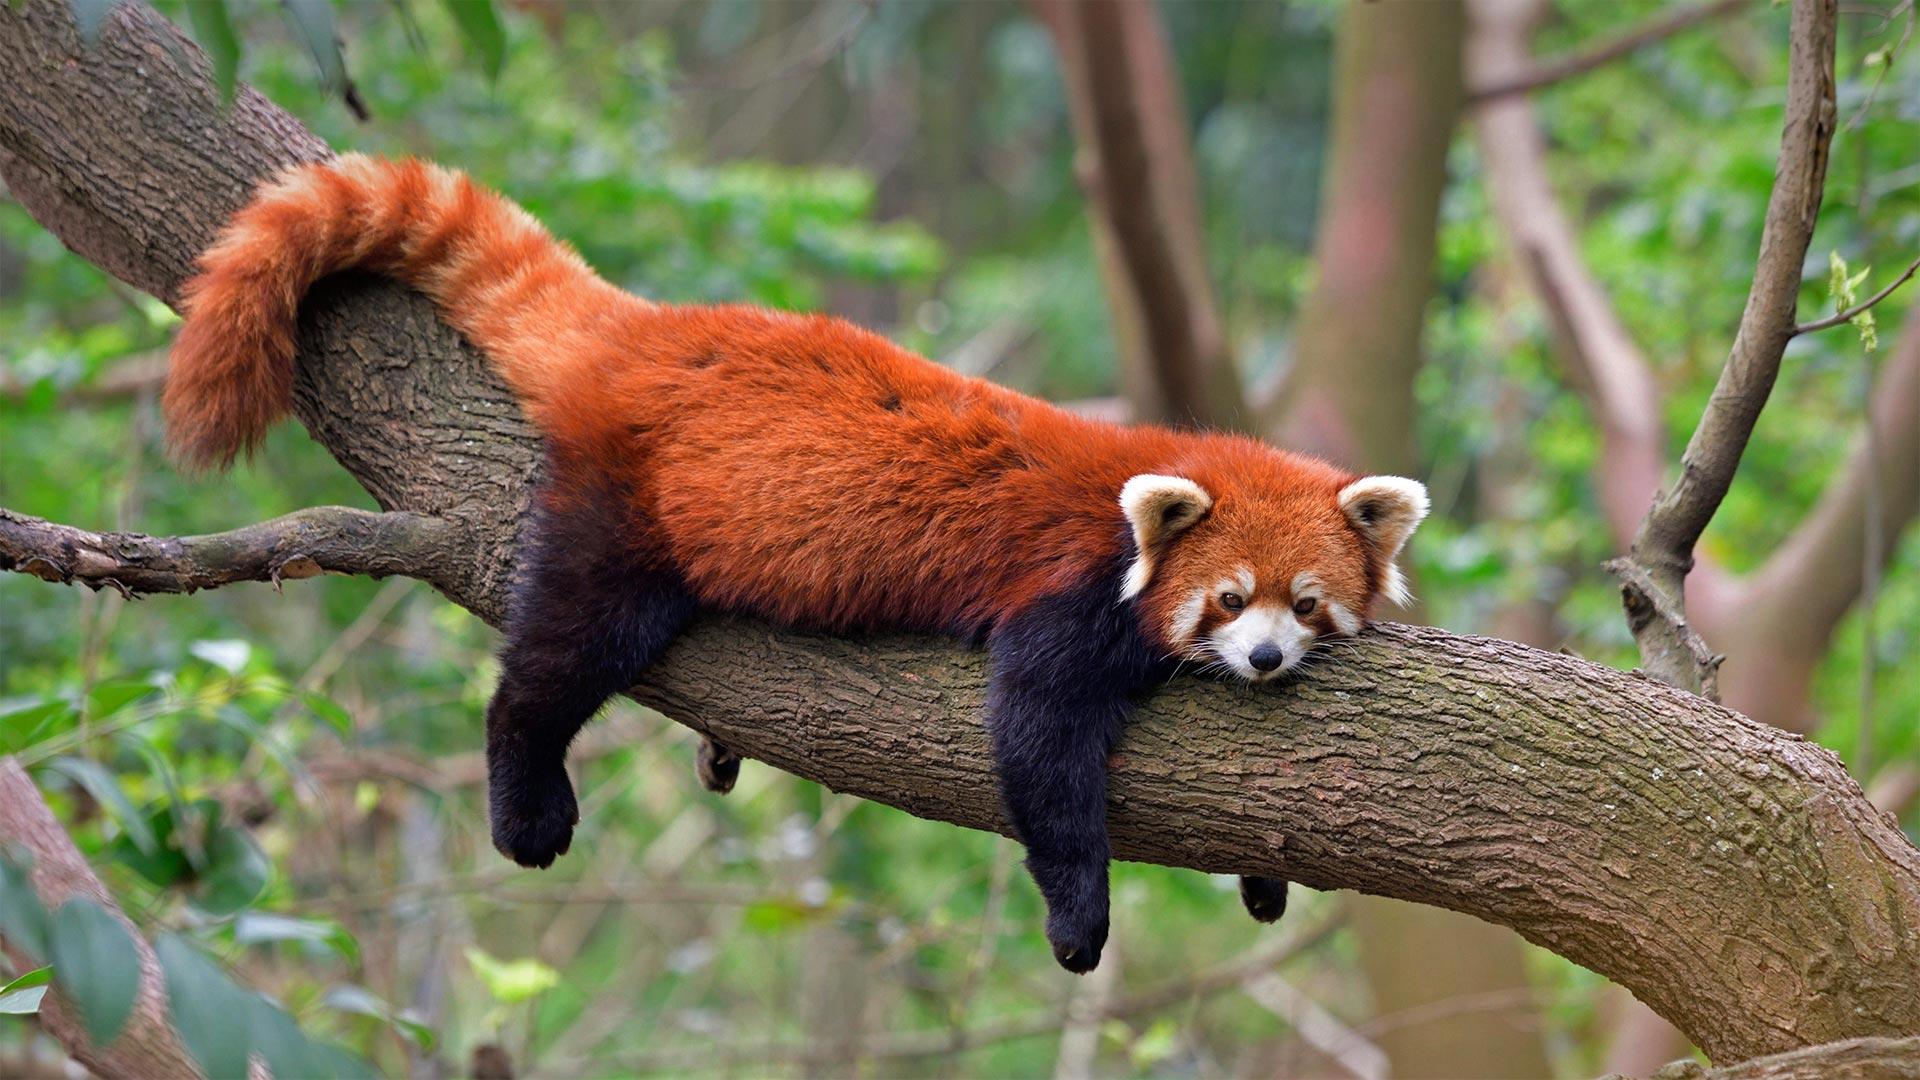 Red panda at the Chengdu Panda Base in Sichuan province, China (© Biosphoto/Alamy)(Bing United States)